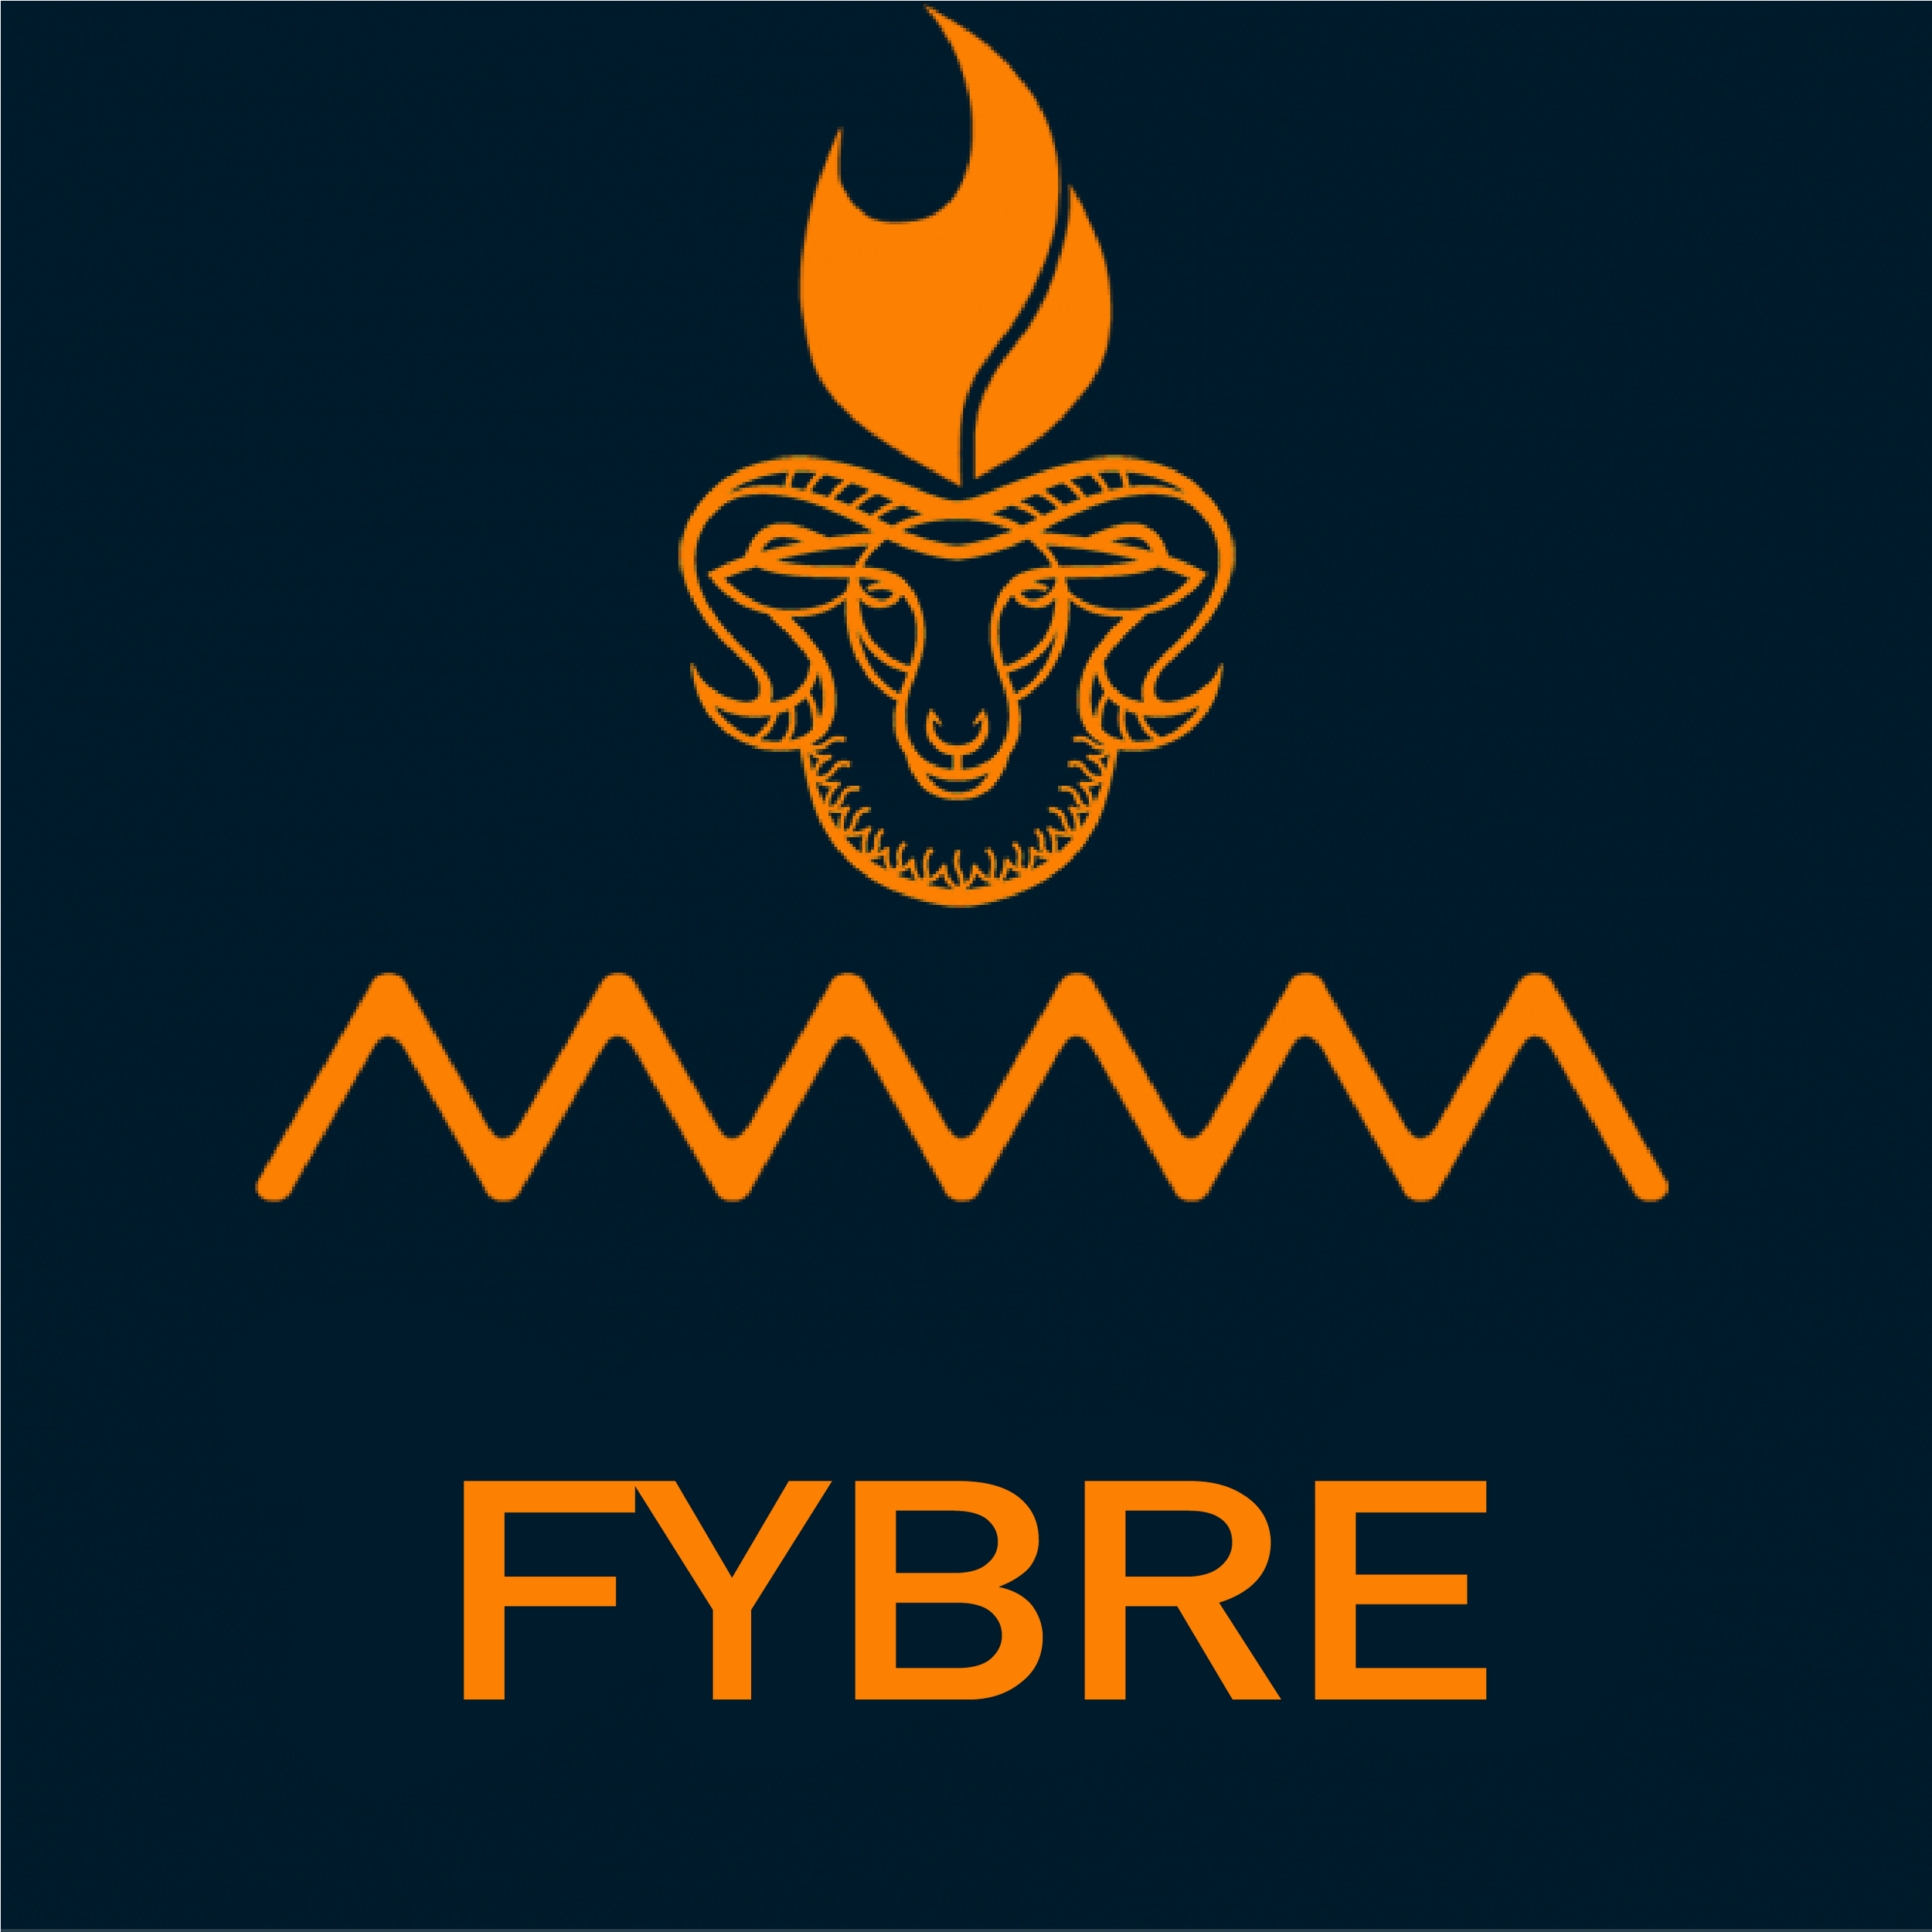 fybre festival.png